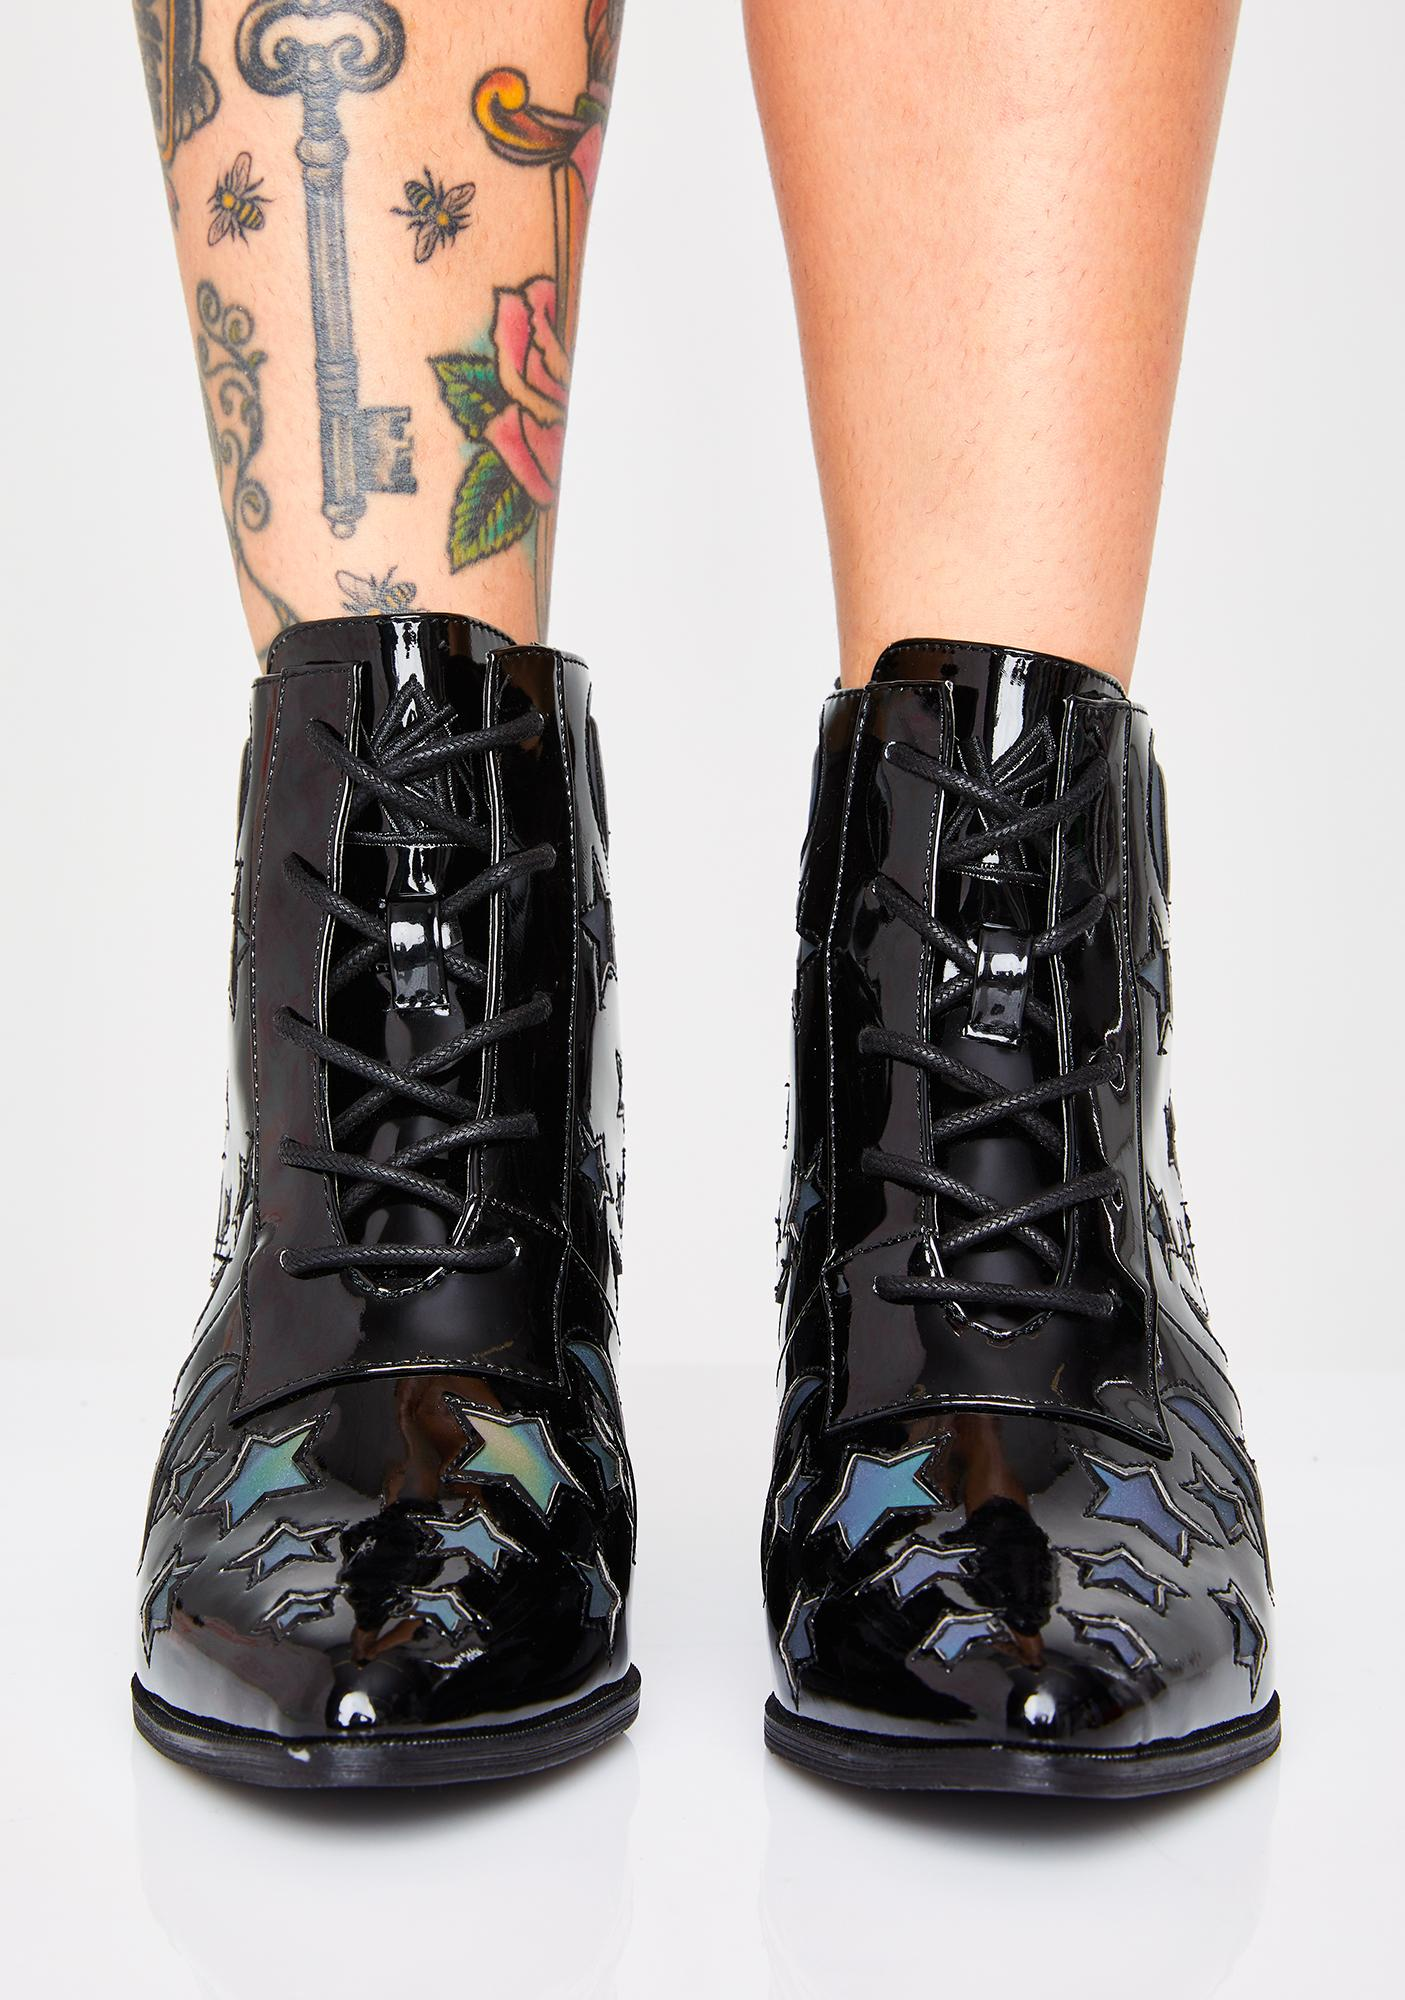 Y.R.U. Aura Reflective Boots